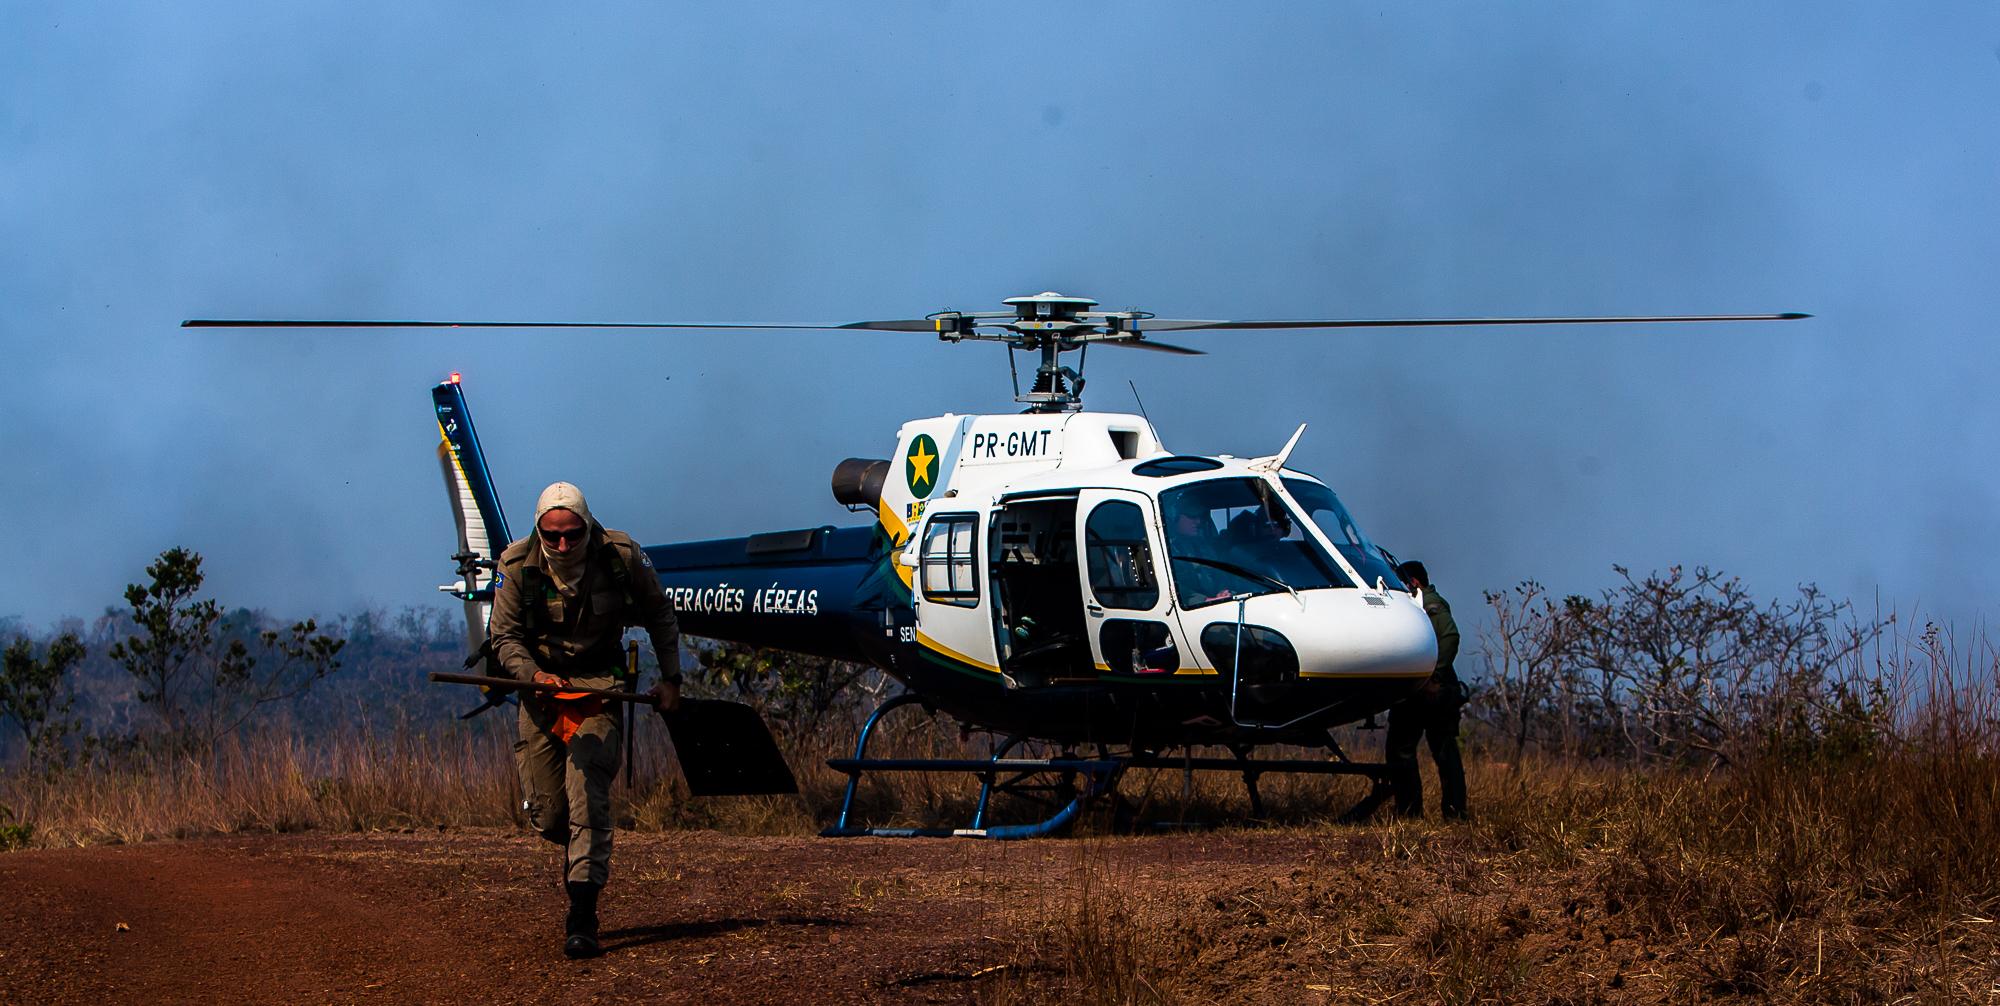 Combatendo queimada na Reserva da Serra Ricardo Franco - Foto por: GCom/MT - Chico Valdiner